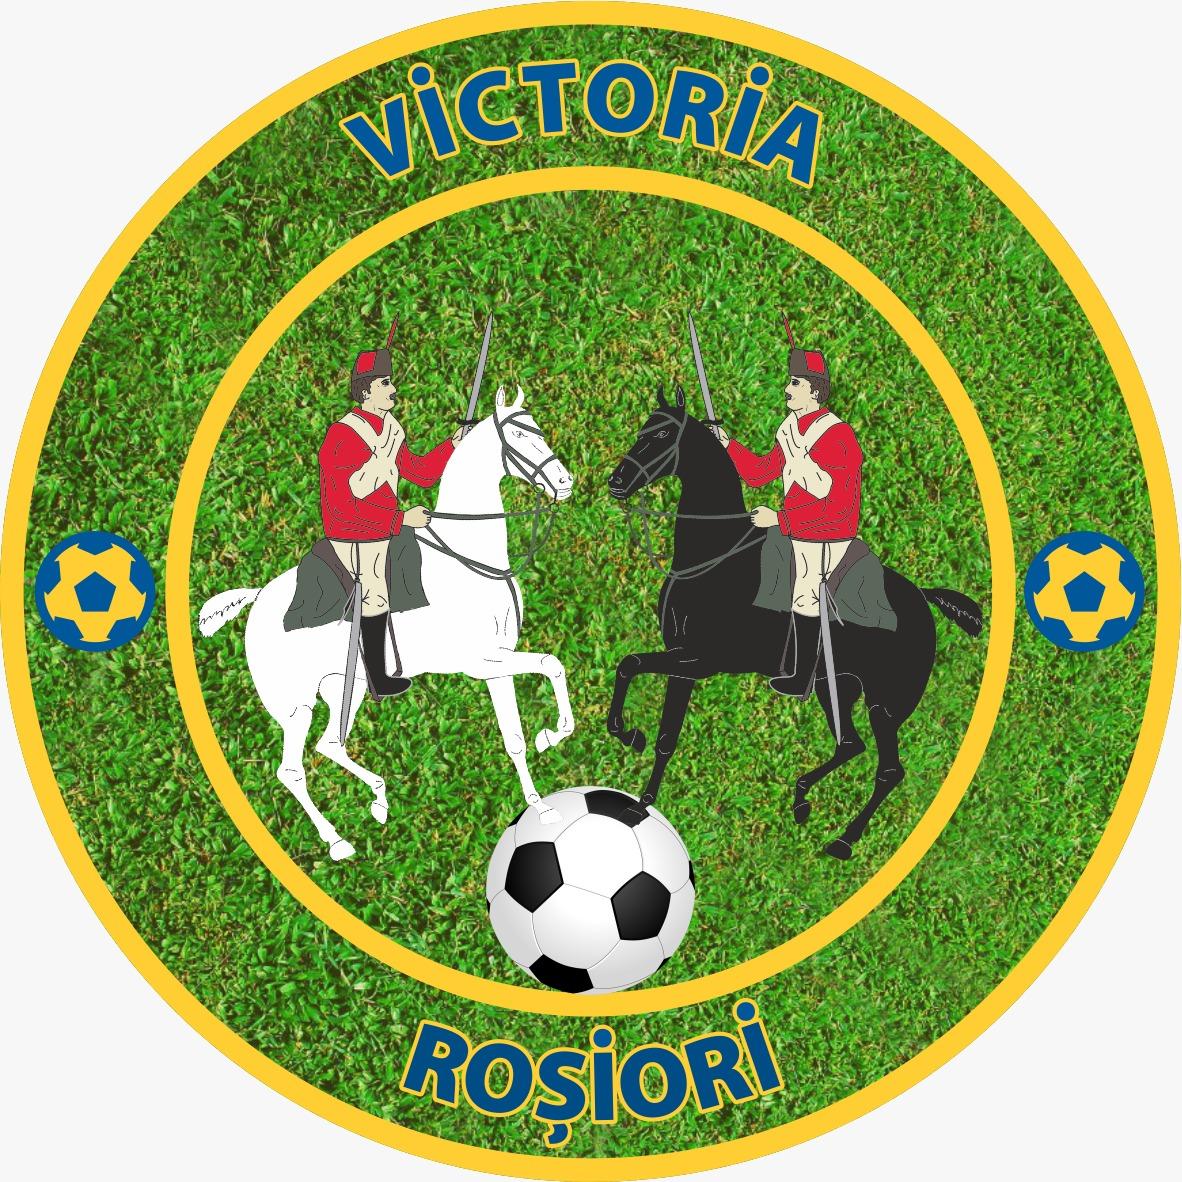 Victoria Rosiori